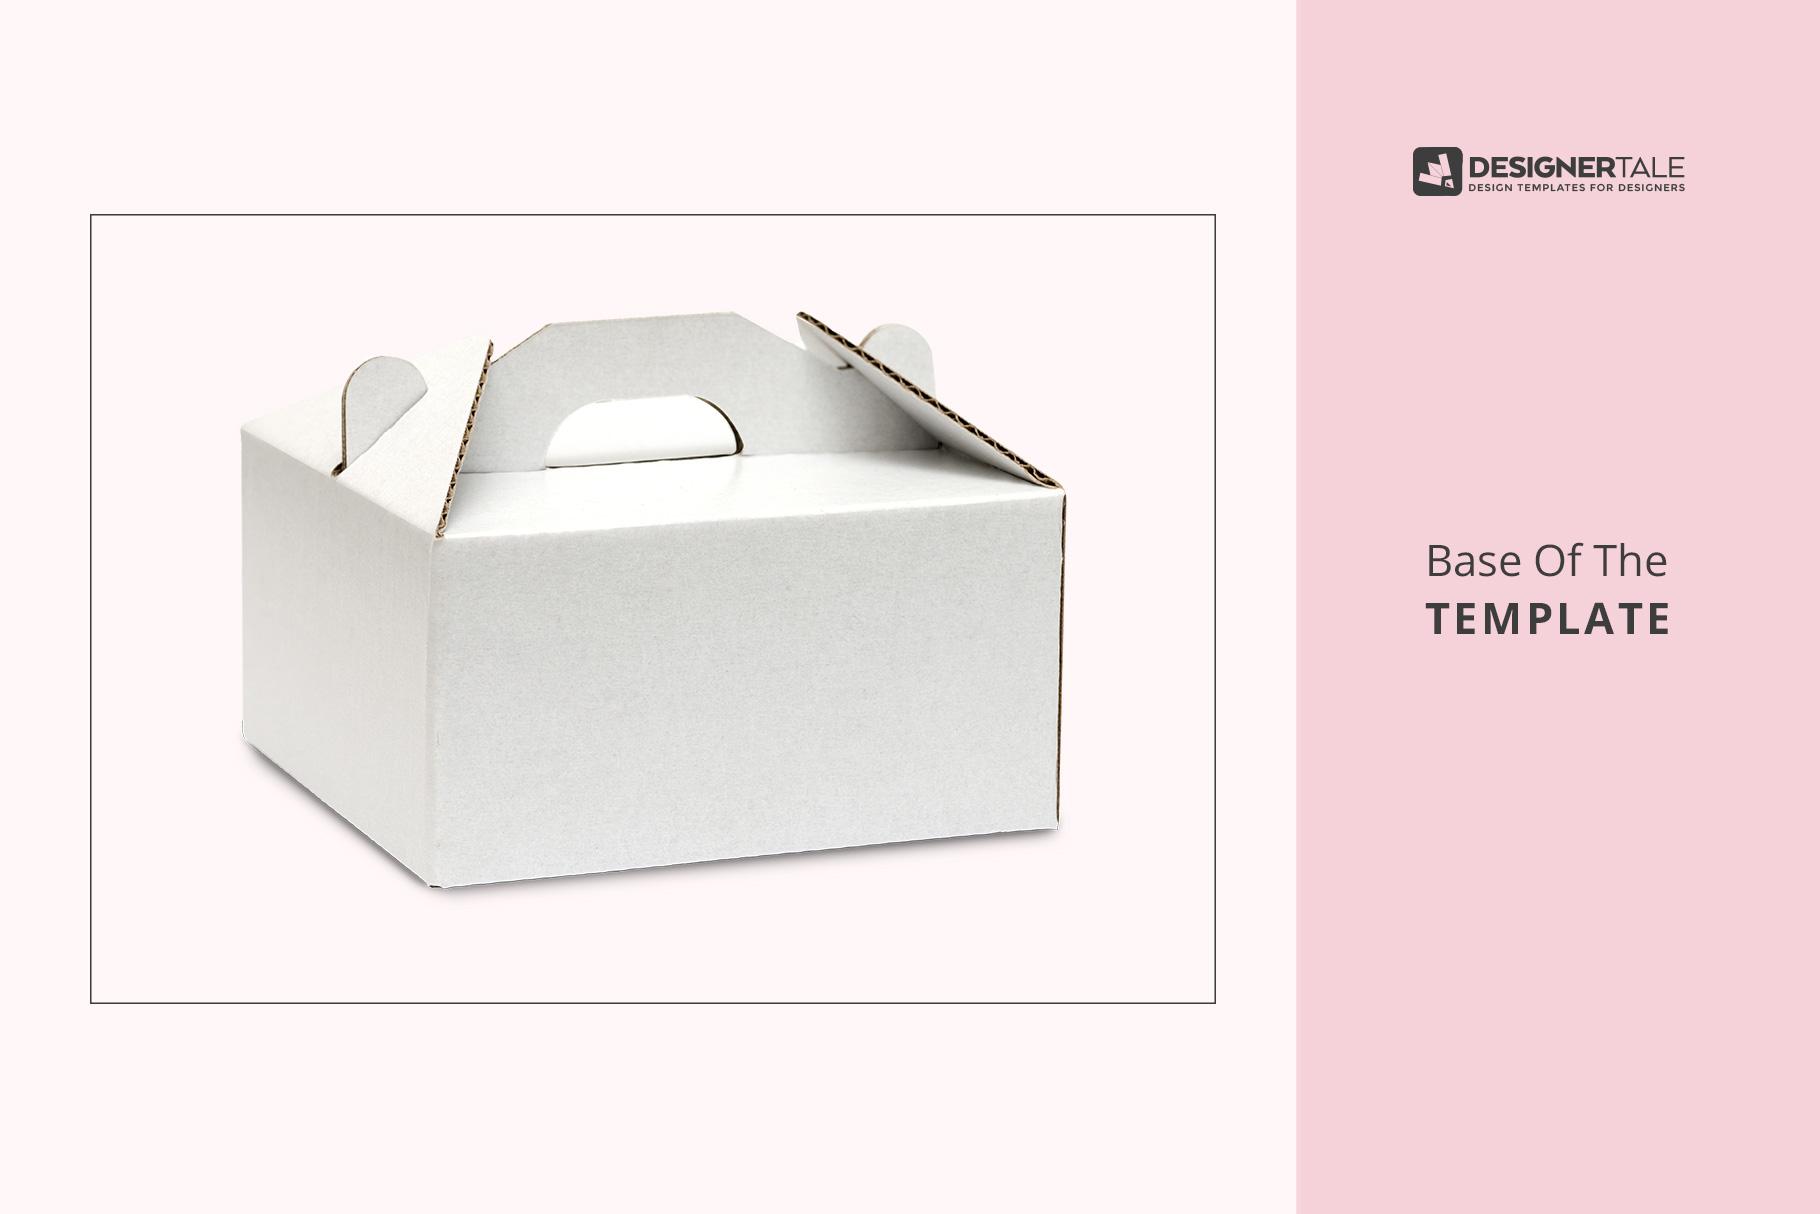 base image of the cake box packaging mockup